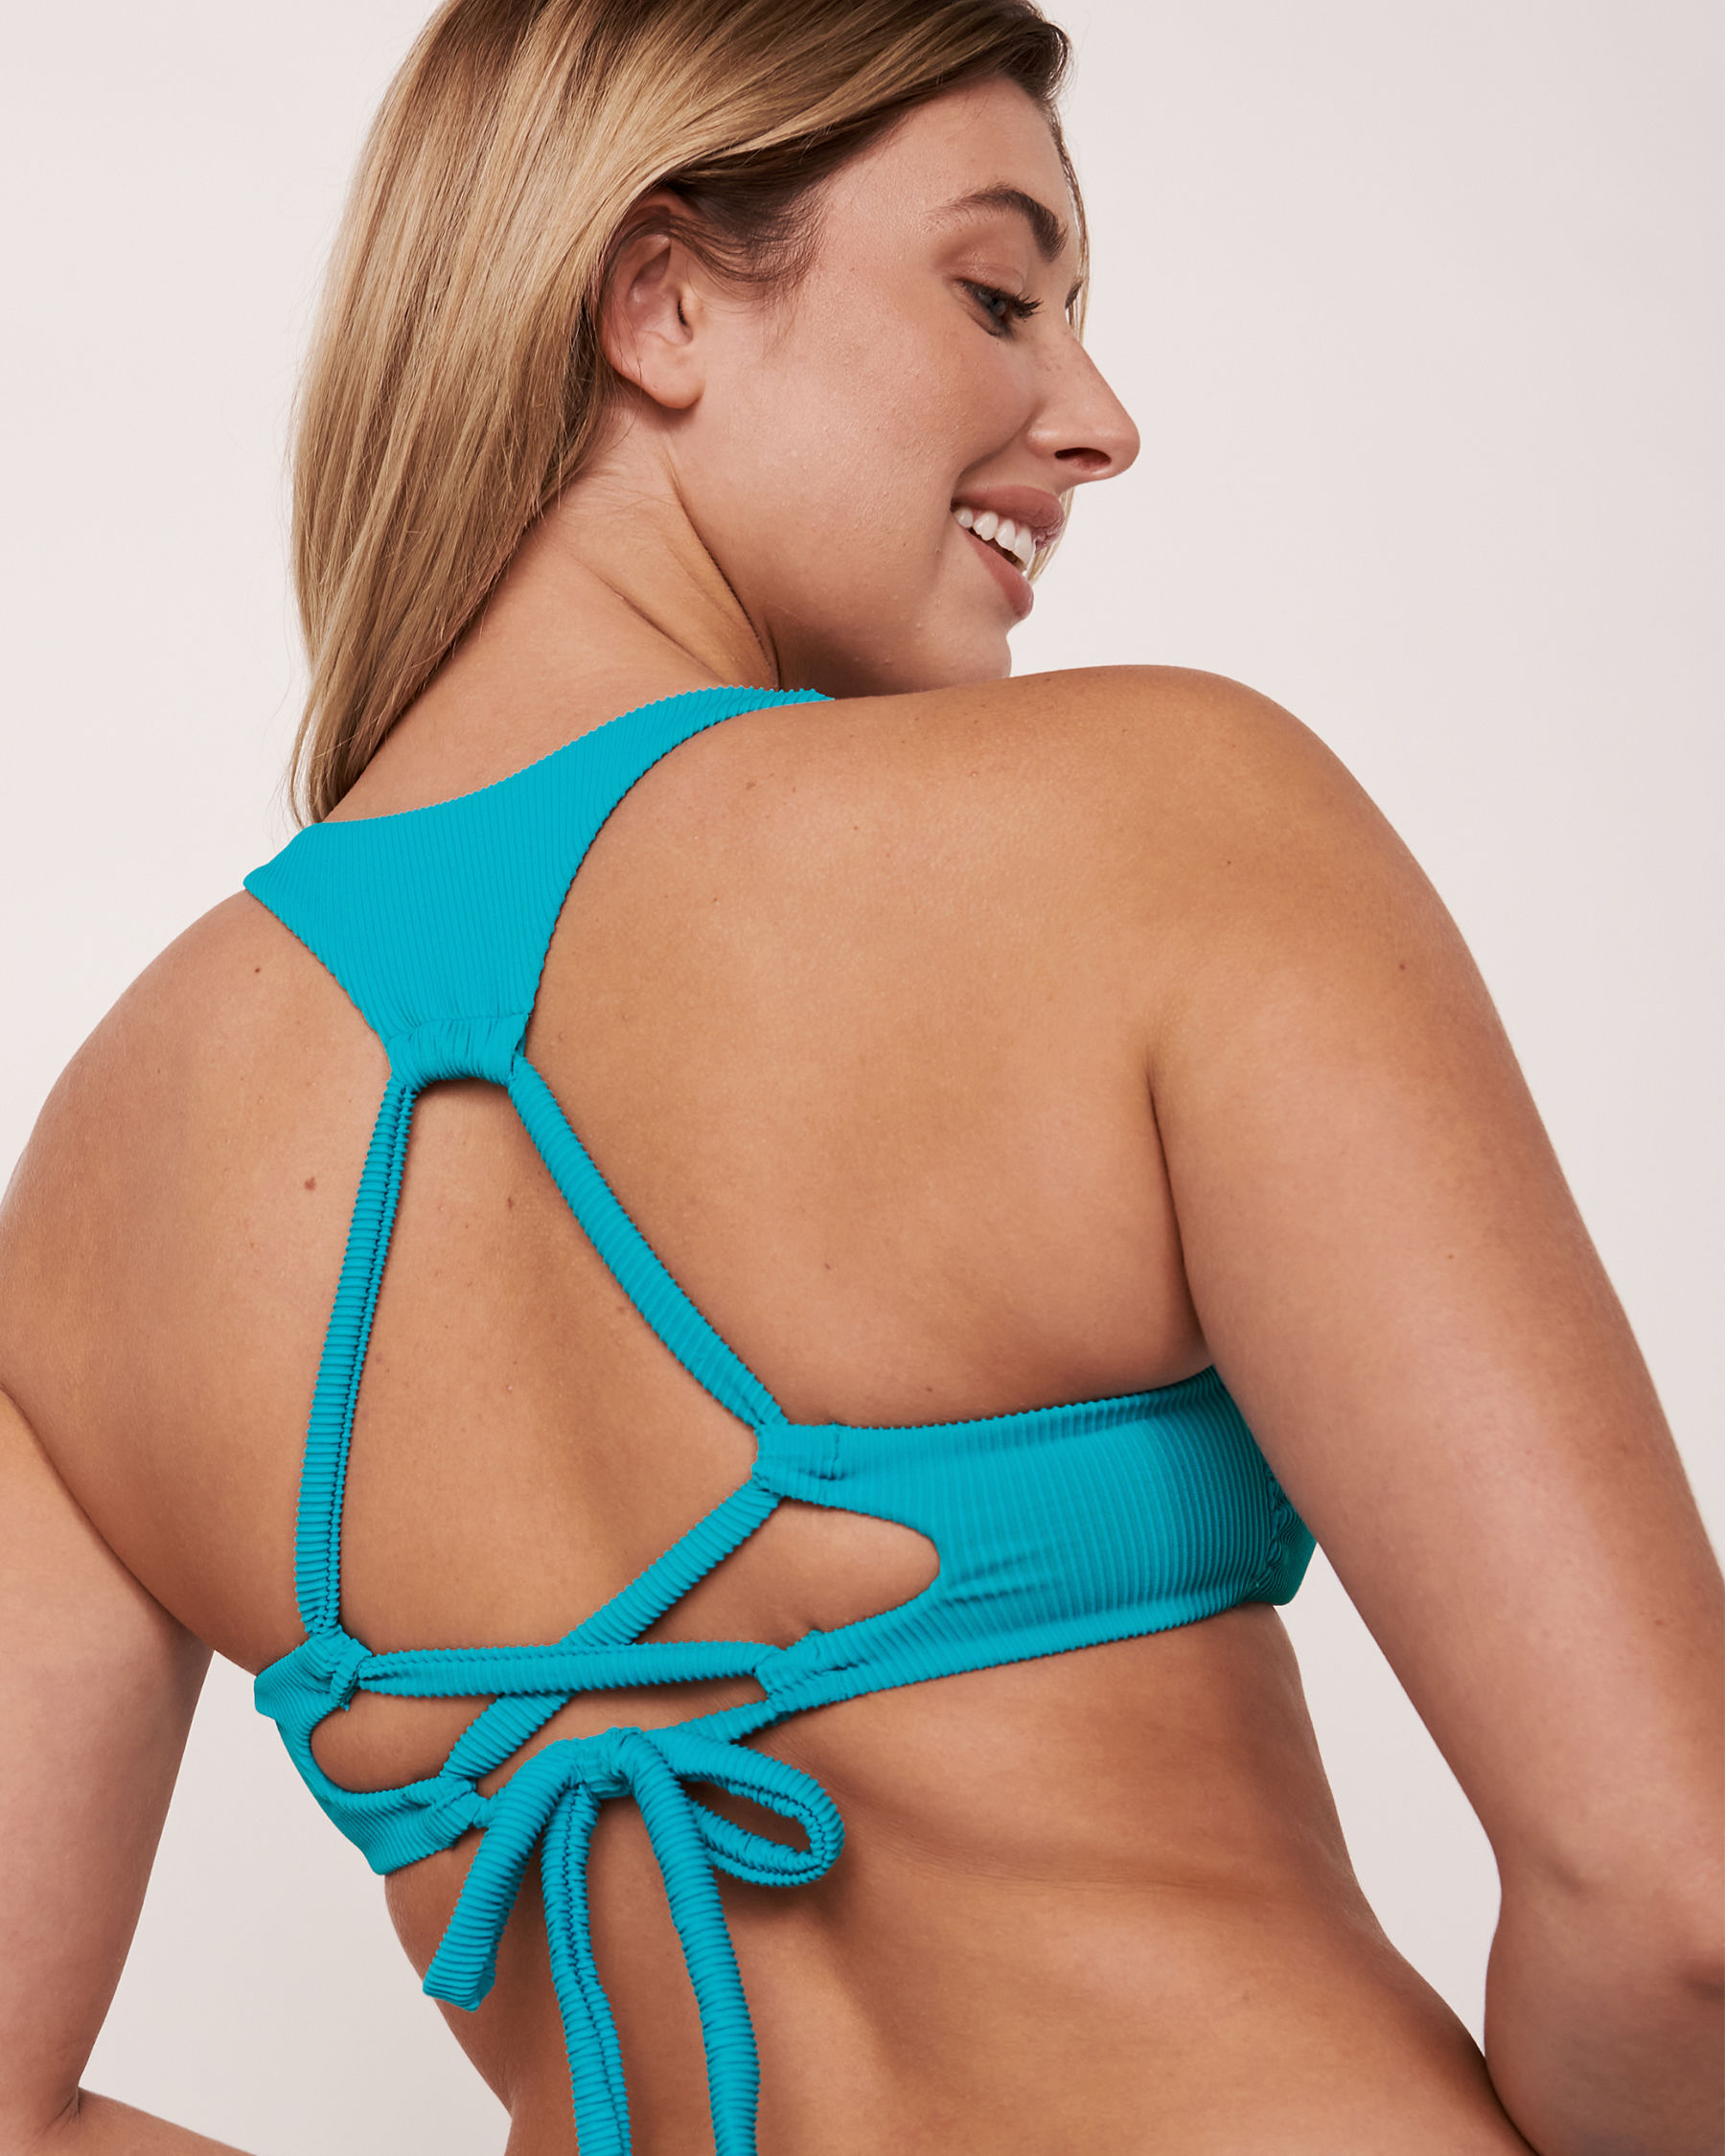 LA VIE EN ROSE AQUA Haut de bikini bralette en fibres recyclées TOOTSIE RIB Bleu 70100071 - Voir2